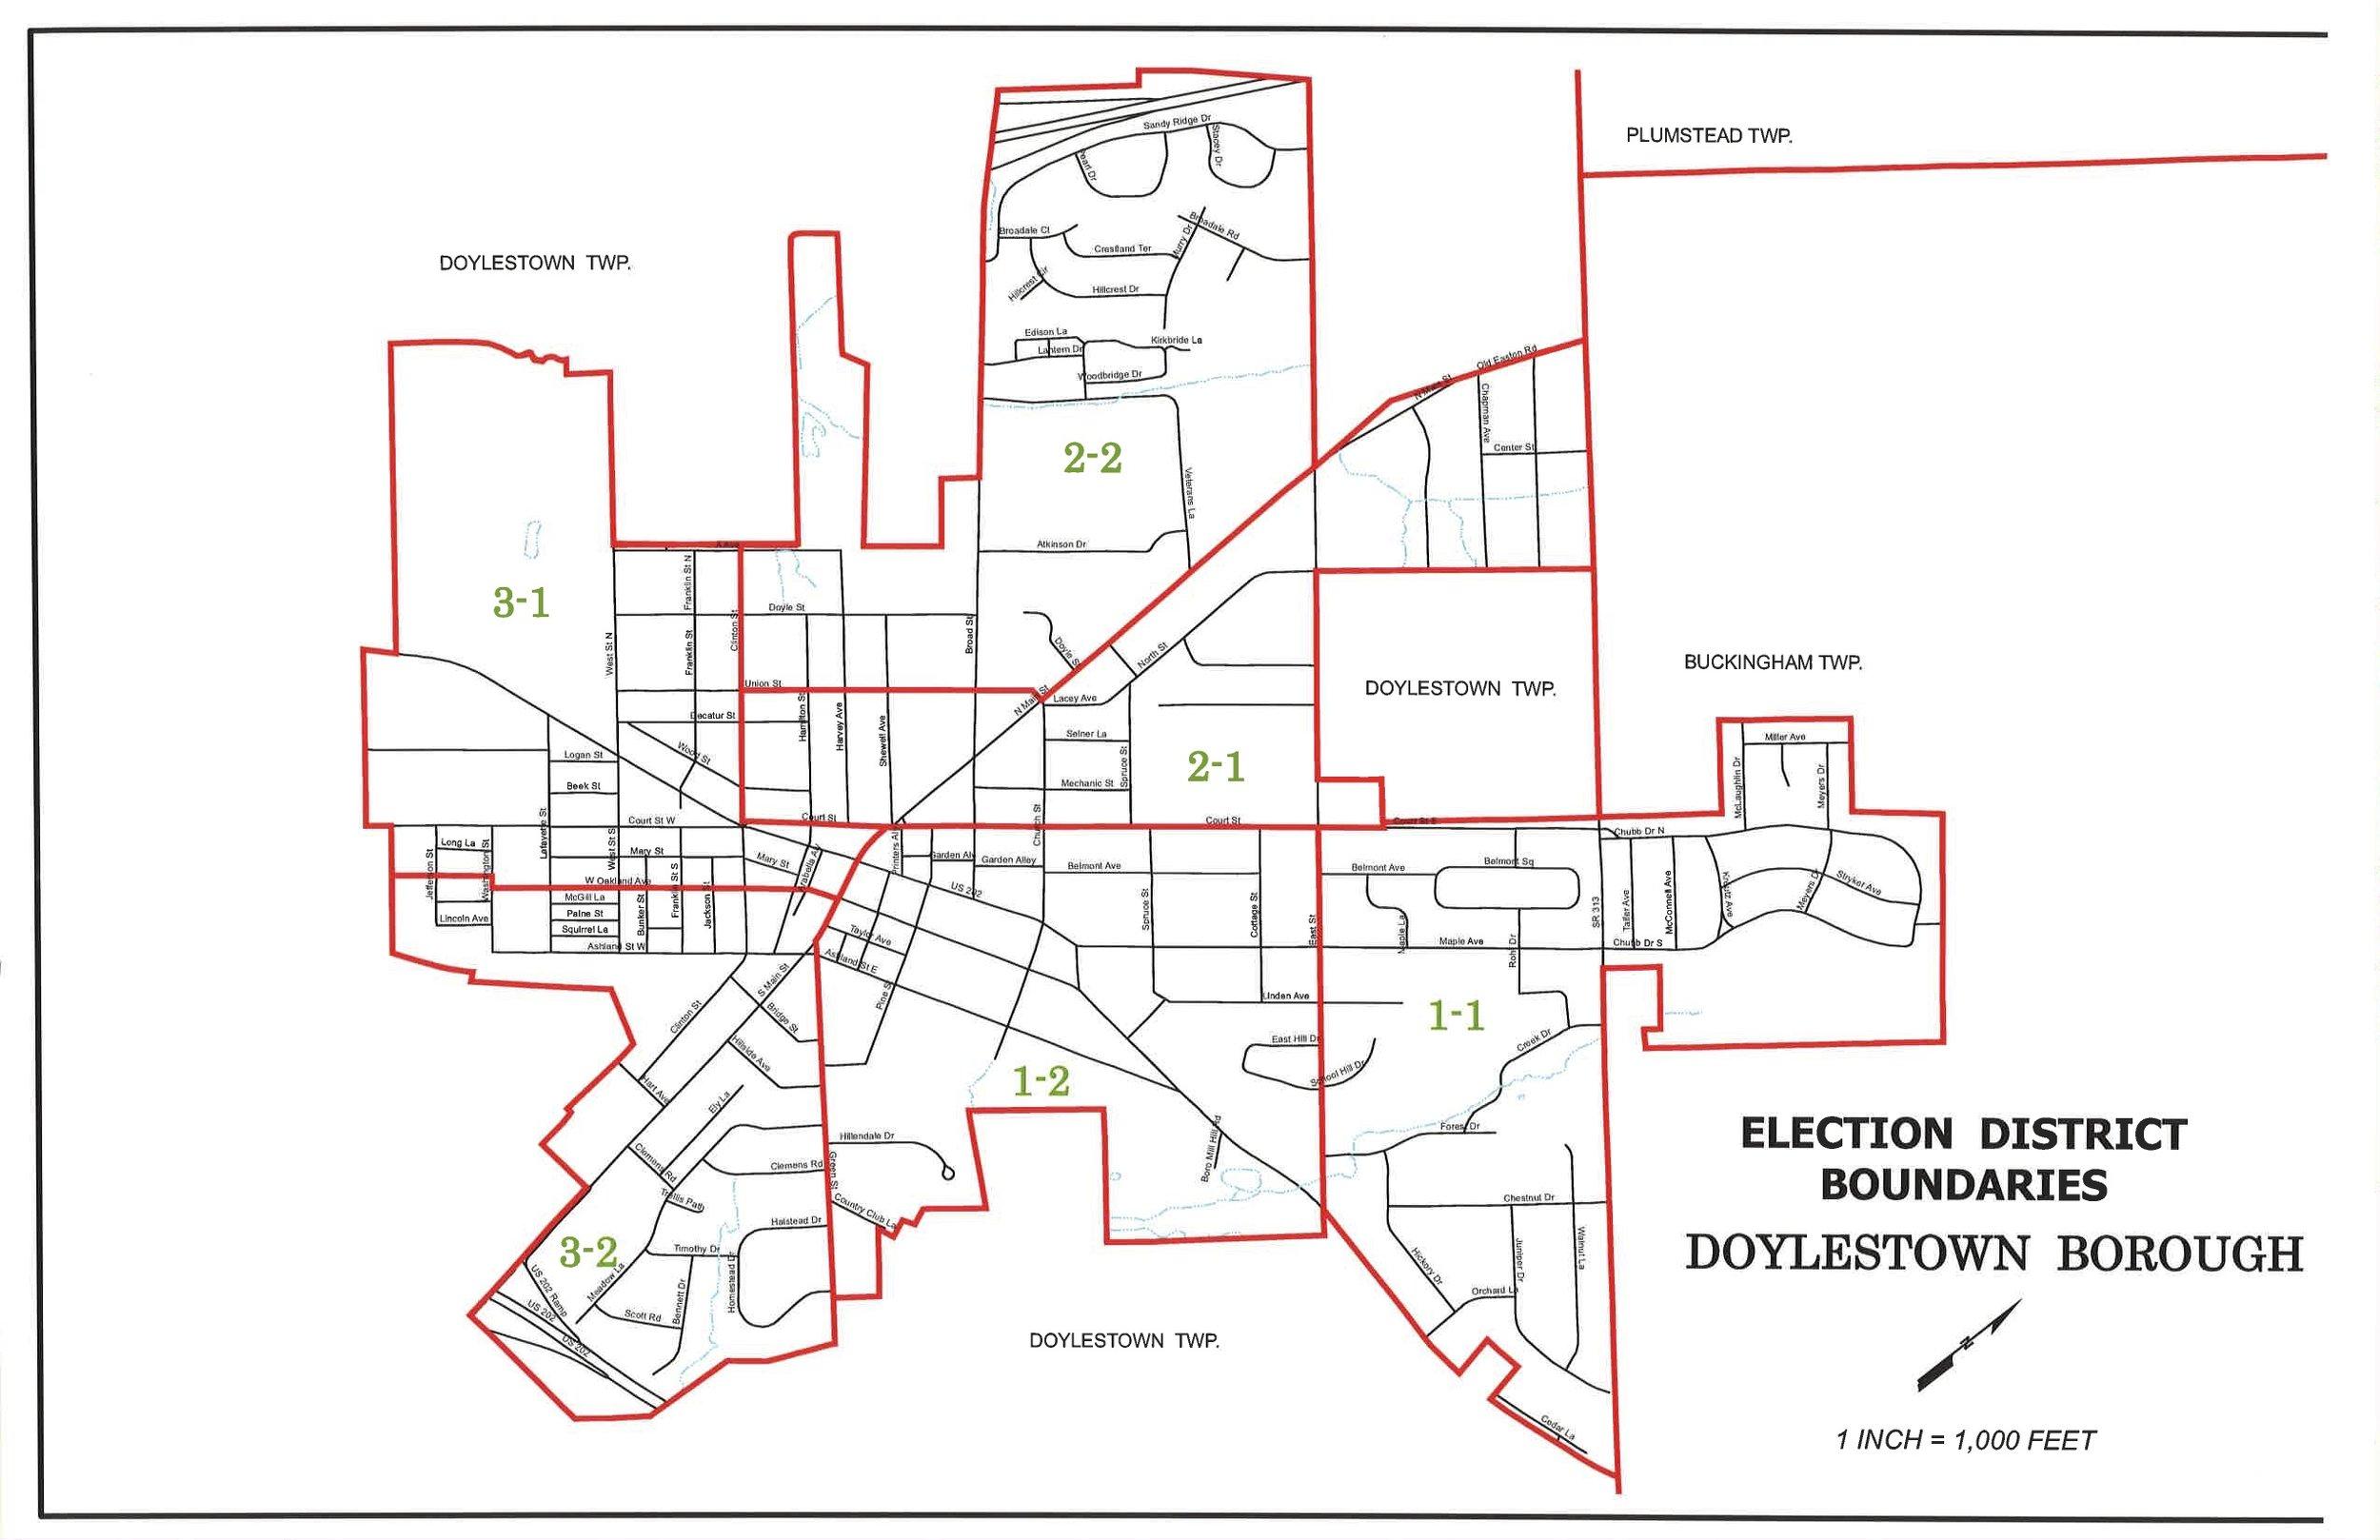 DoylestownBoroughElectionDistricts.jpg